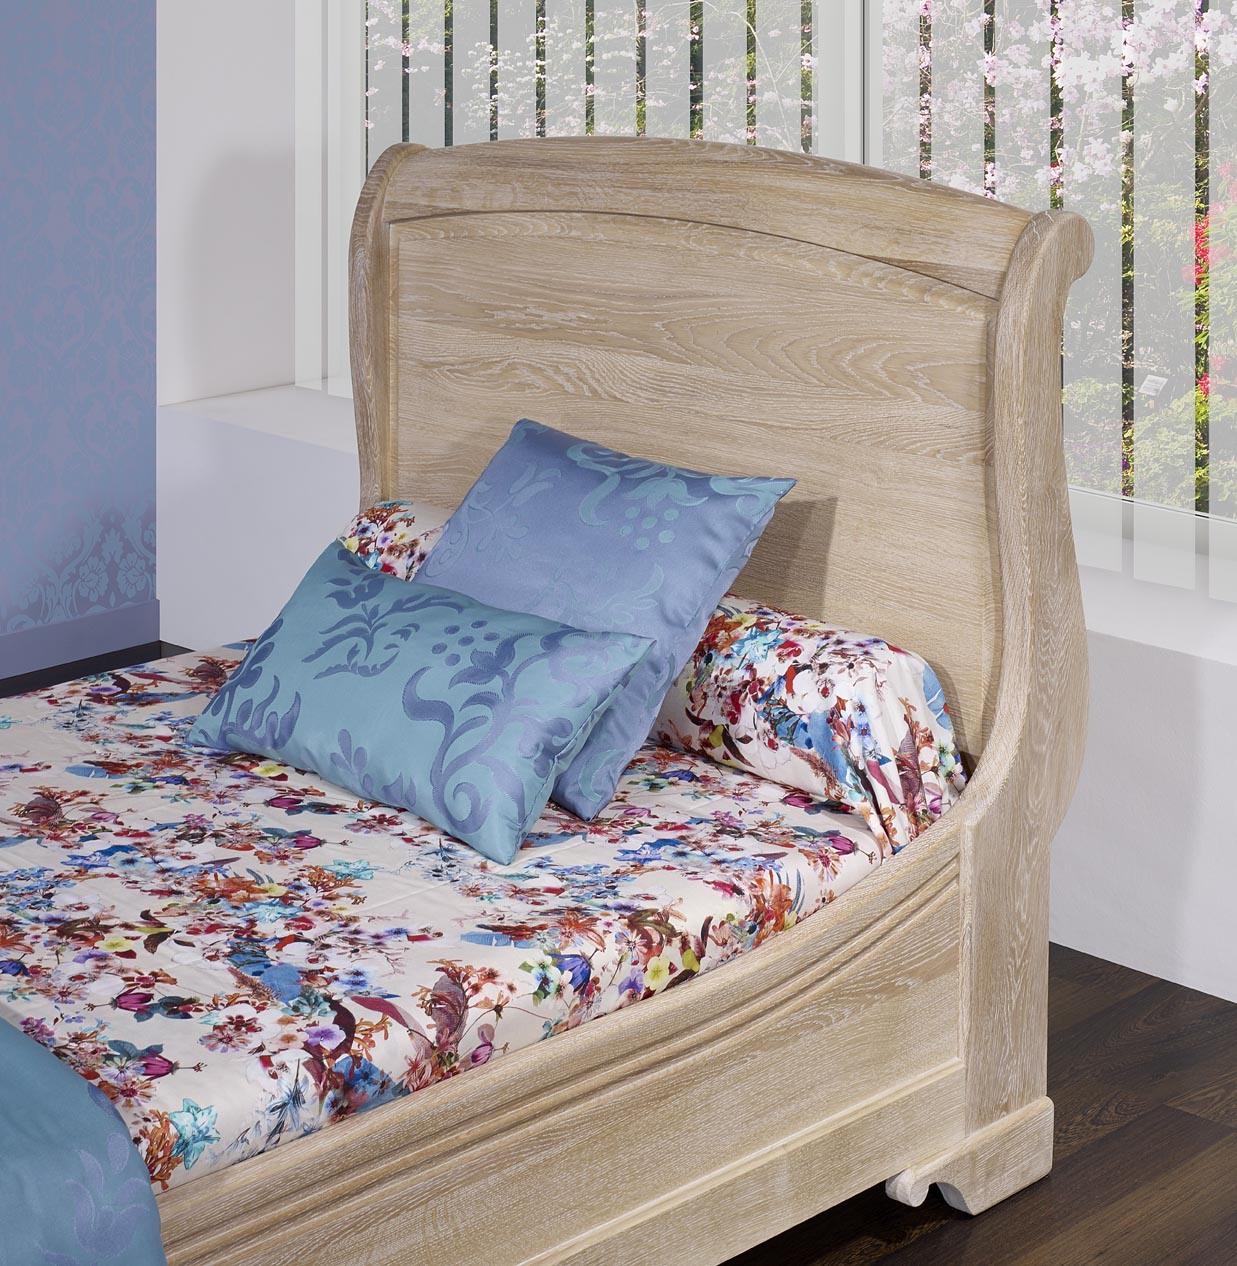 lit 90x190 de style louis philippe diego en ch ne massif finition ch ne bross blanchi meuble. Black Bedroom Furniture Sets. Home Design Ideas